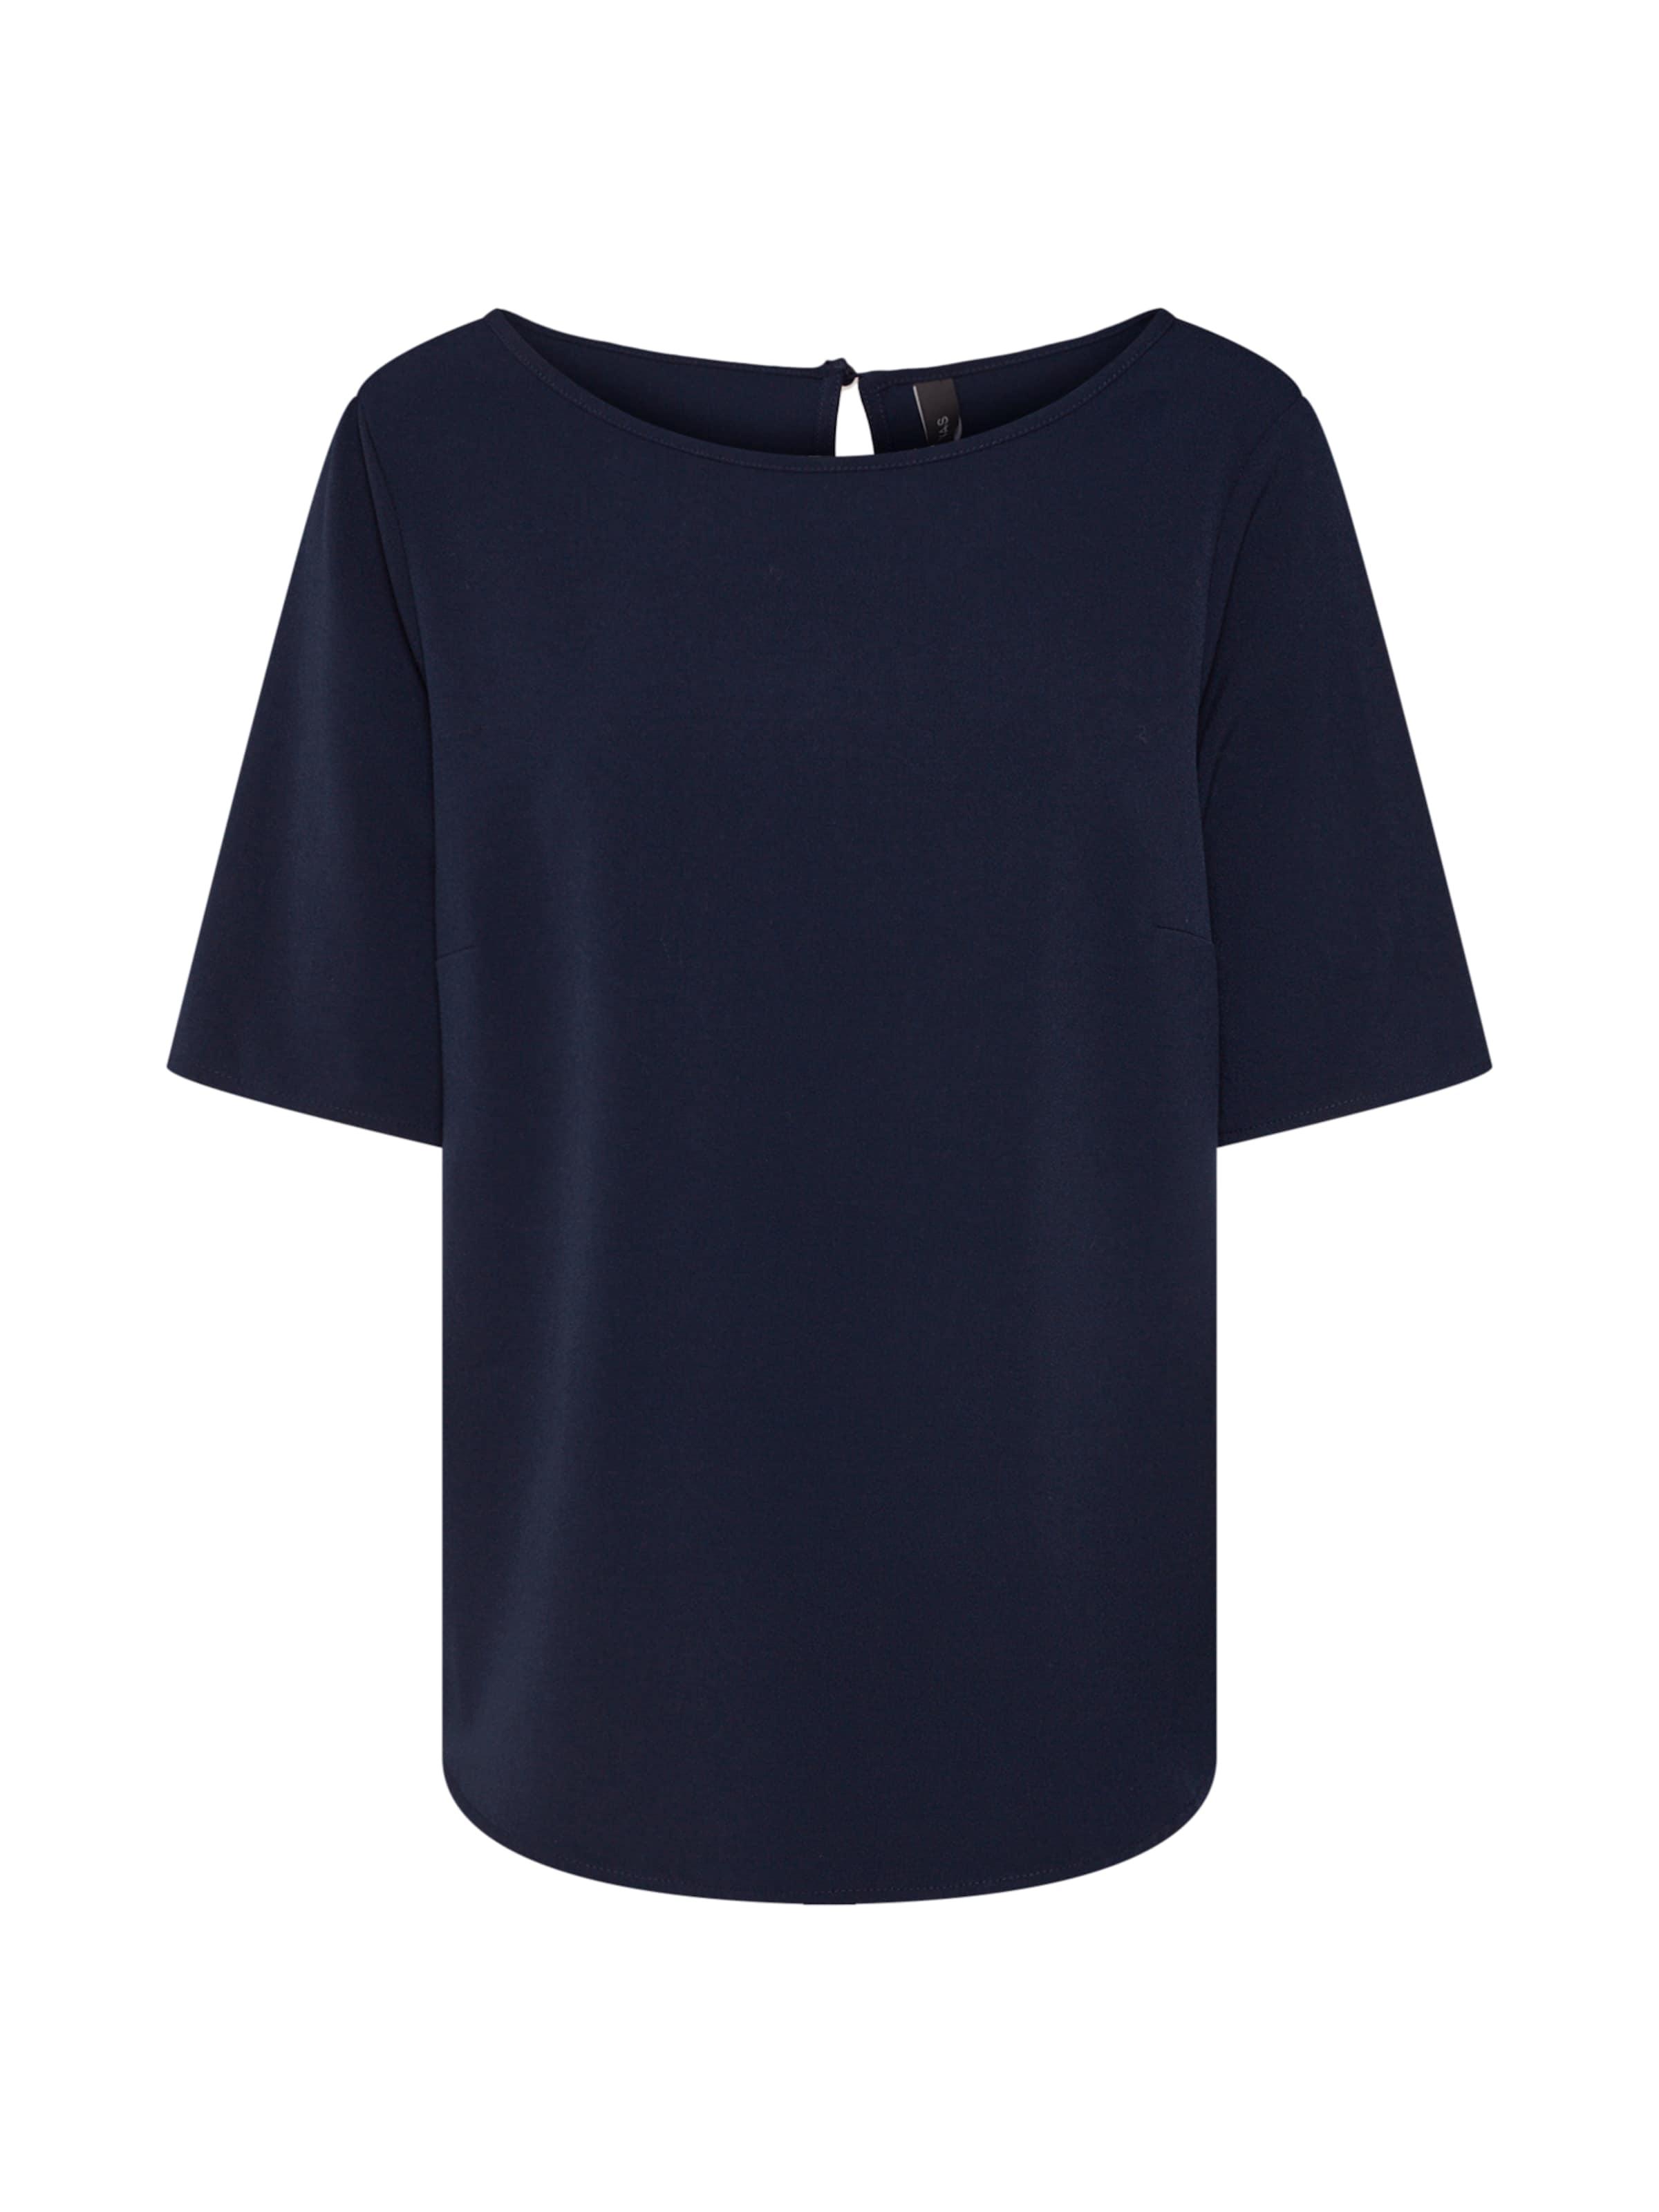 Y s 'clady' a Bleu Foncé T shirt En rdCexBo